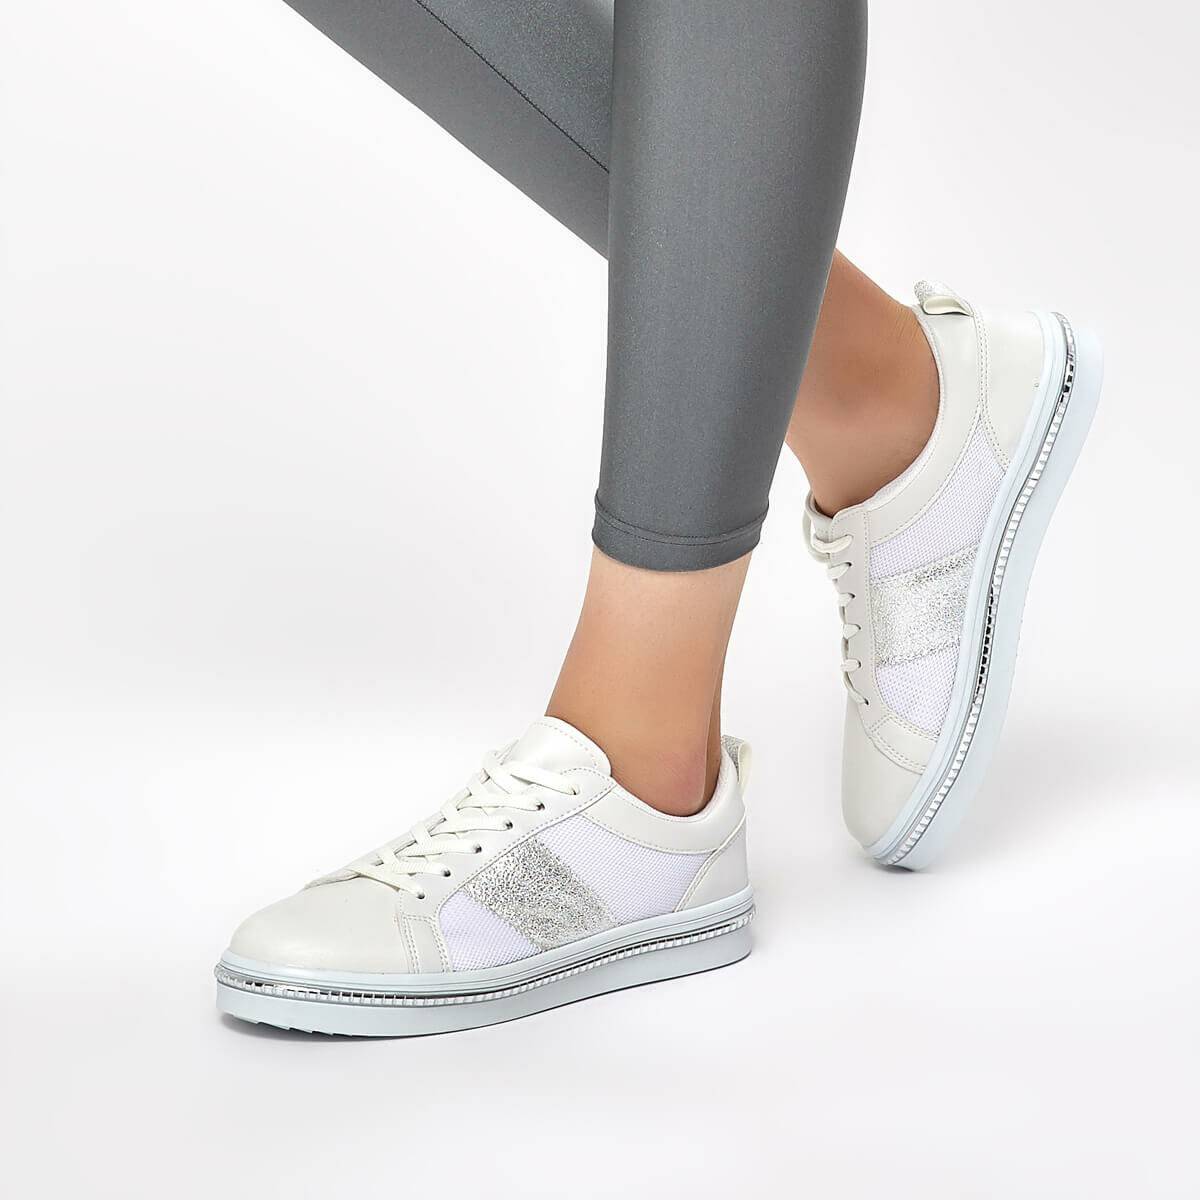 FLO 91.313340.Z White Women 'S Sneaker Shoes Polaris